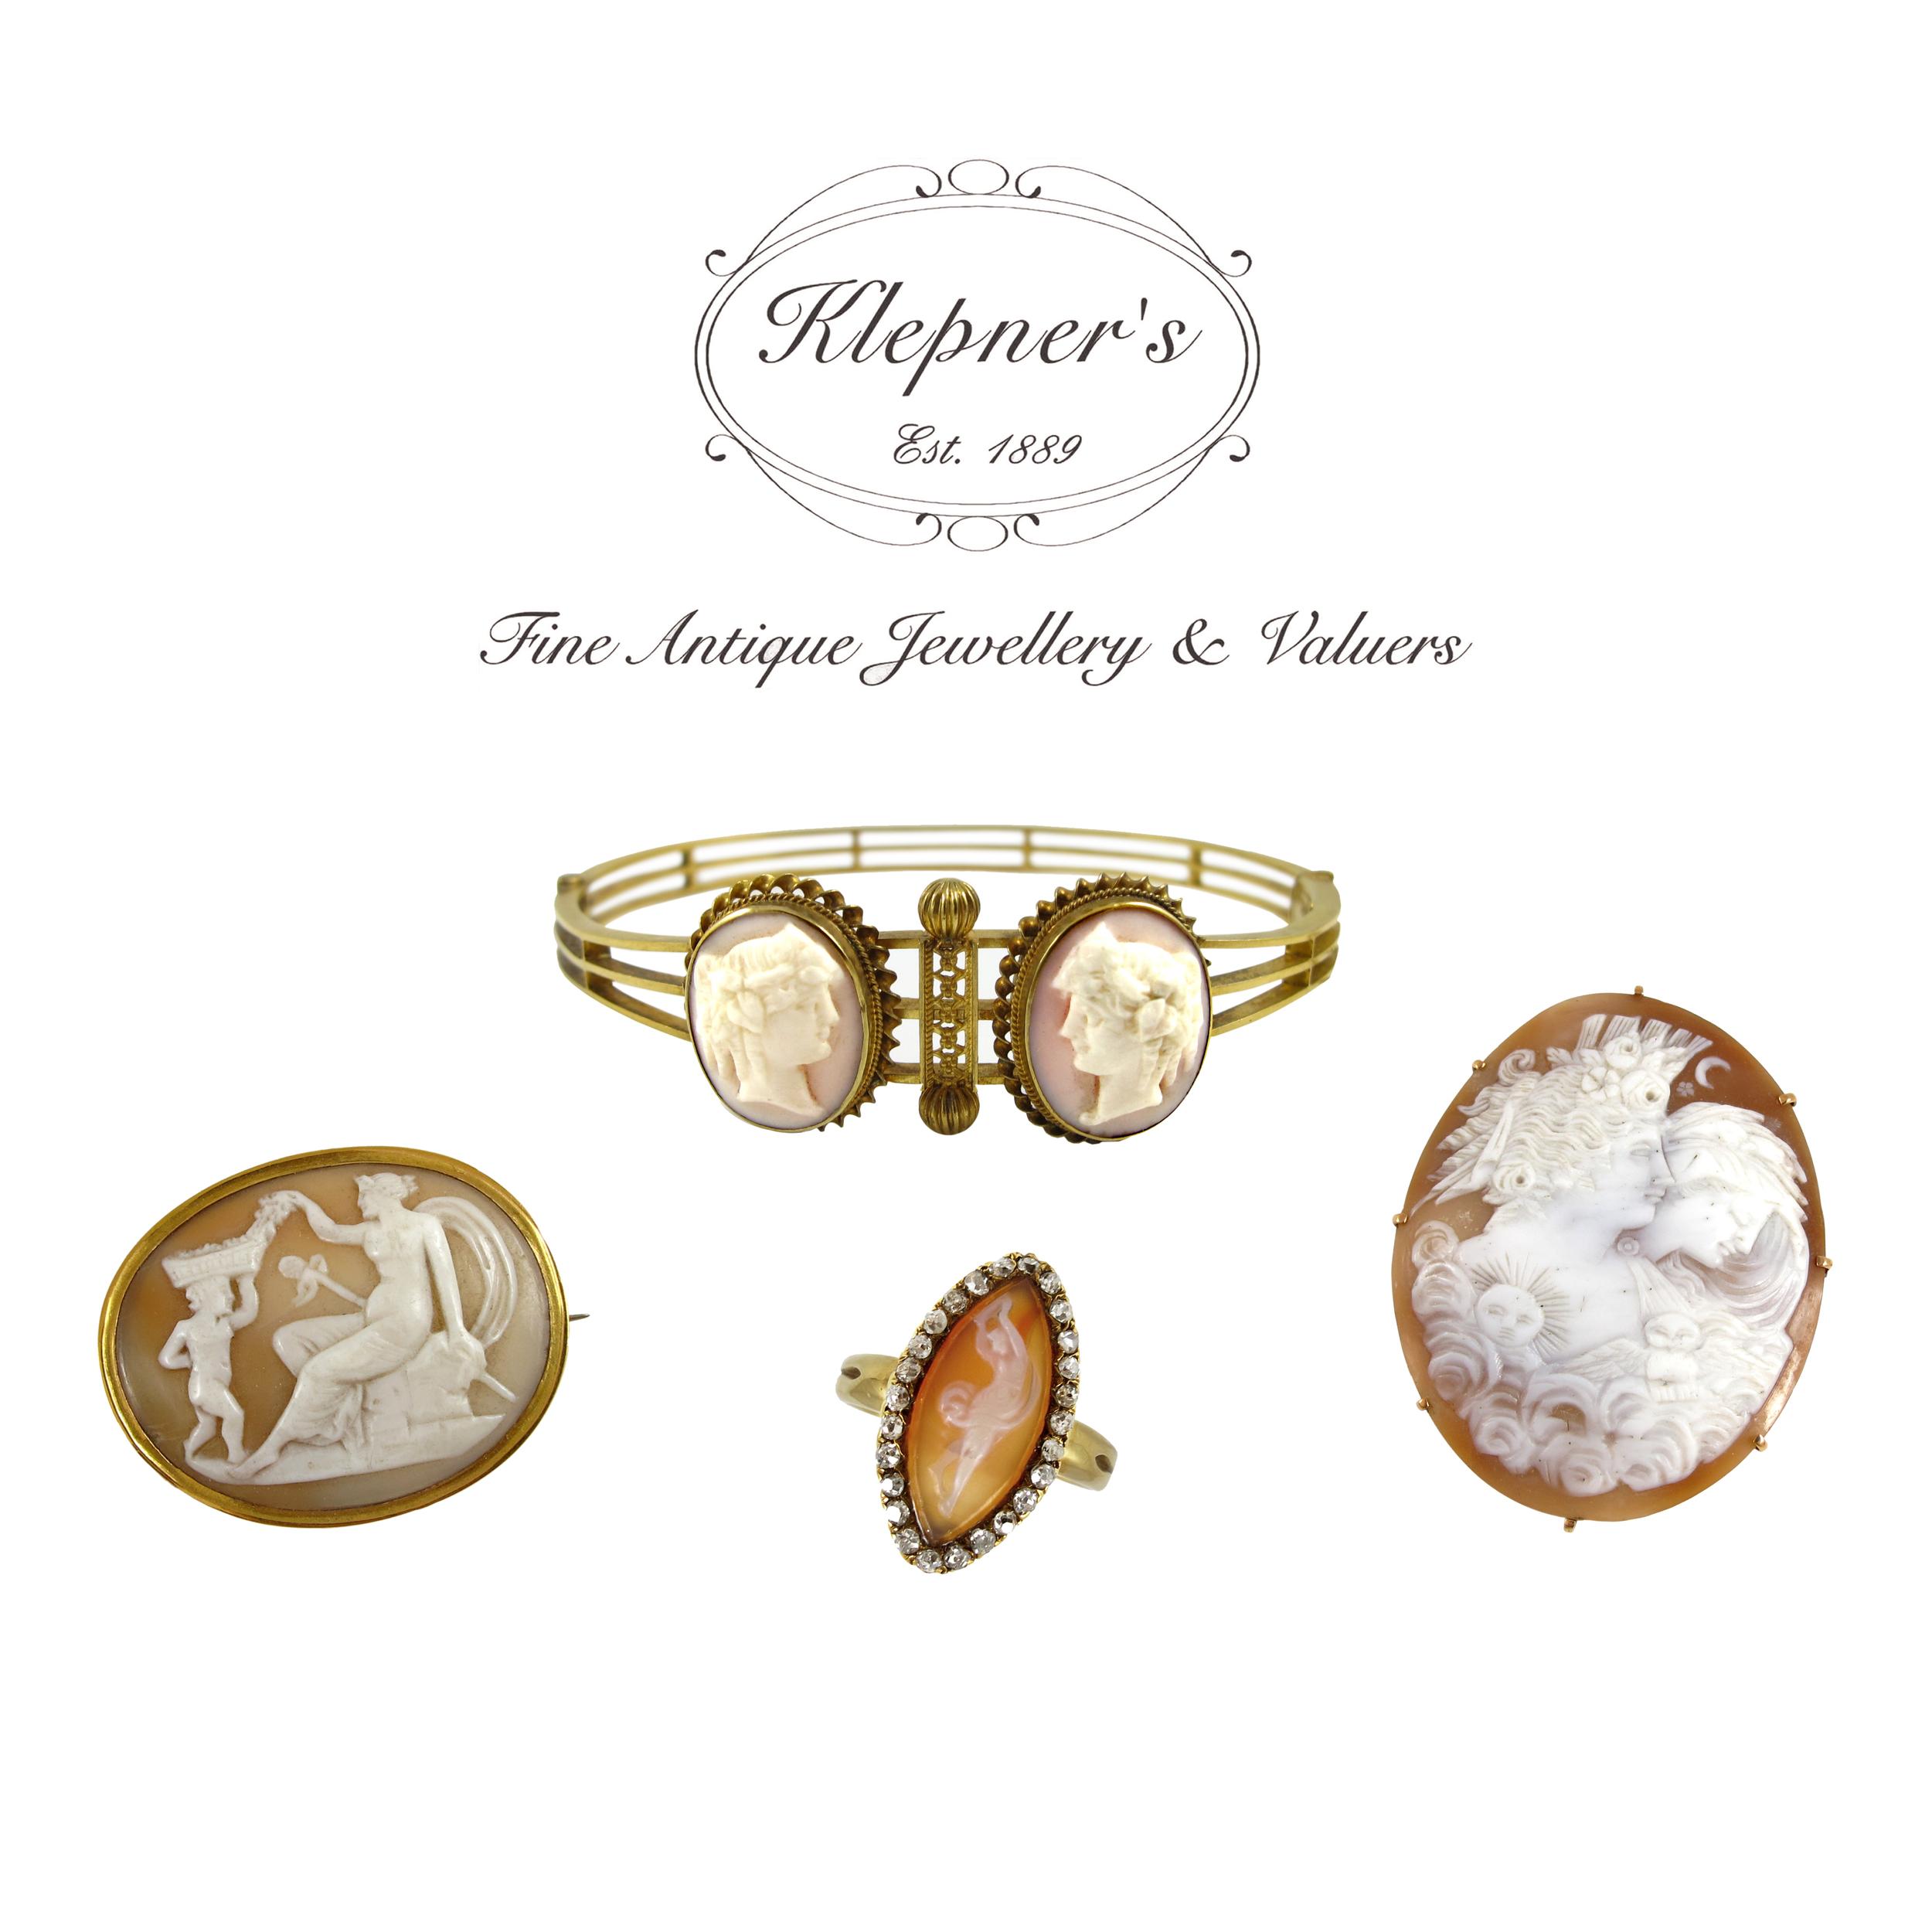 Antique Victorian Cameo Jewellery.jpg